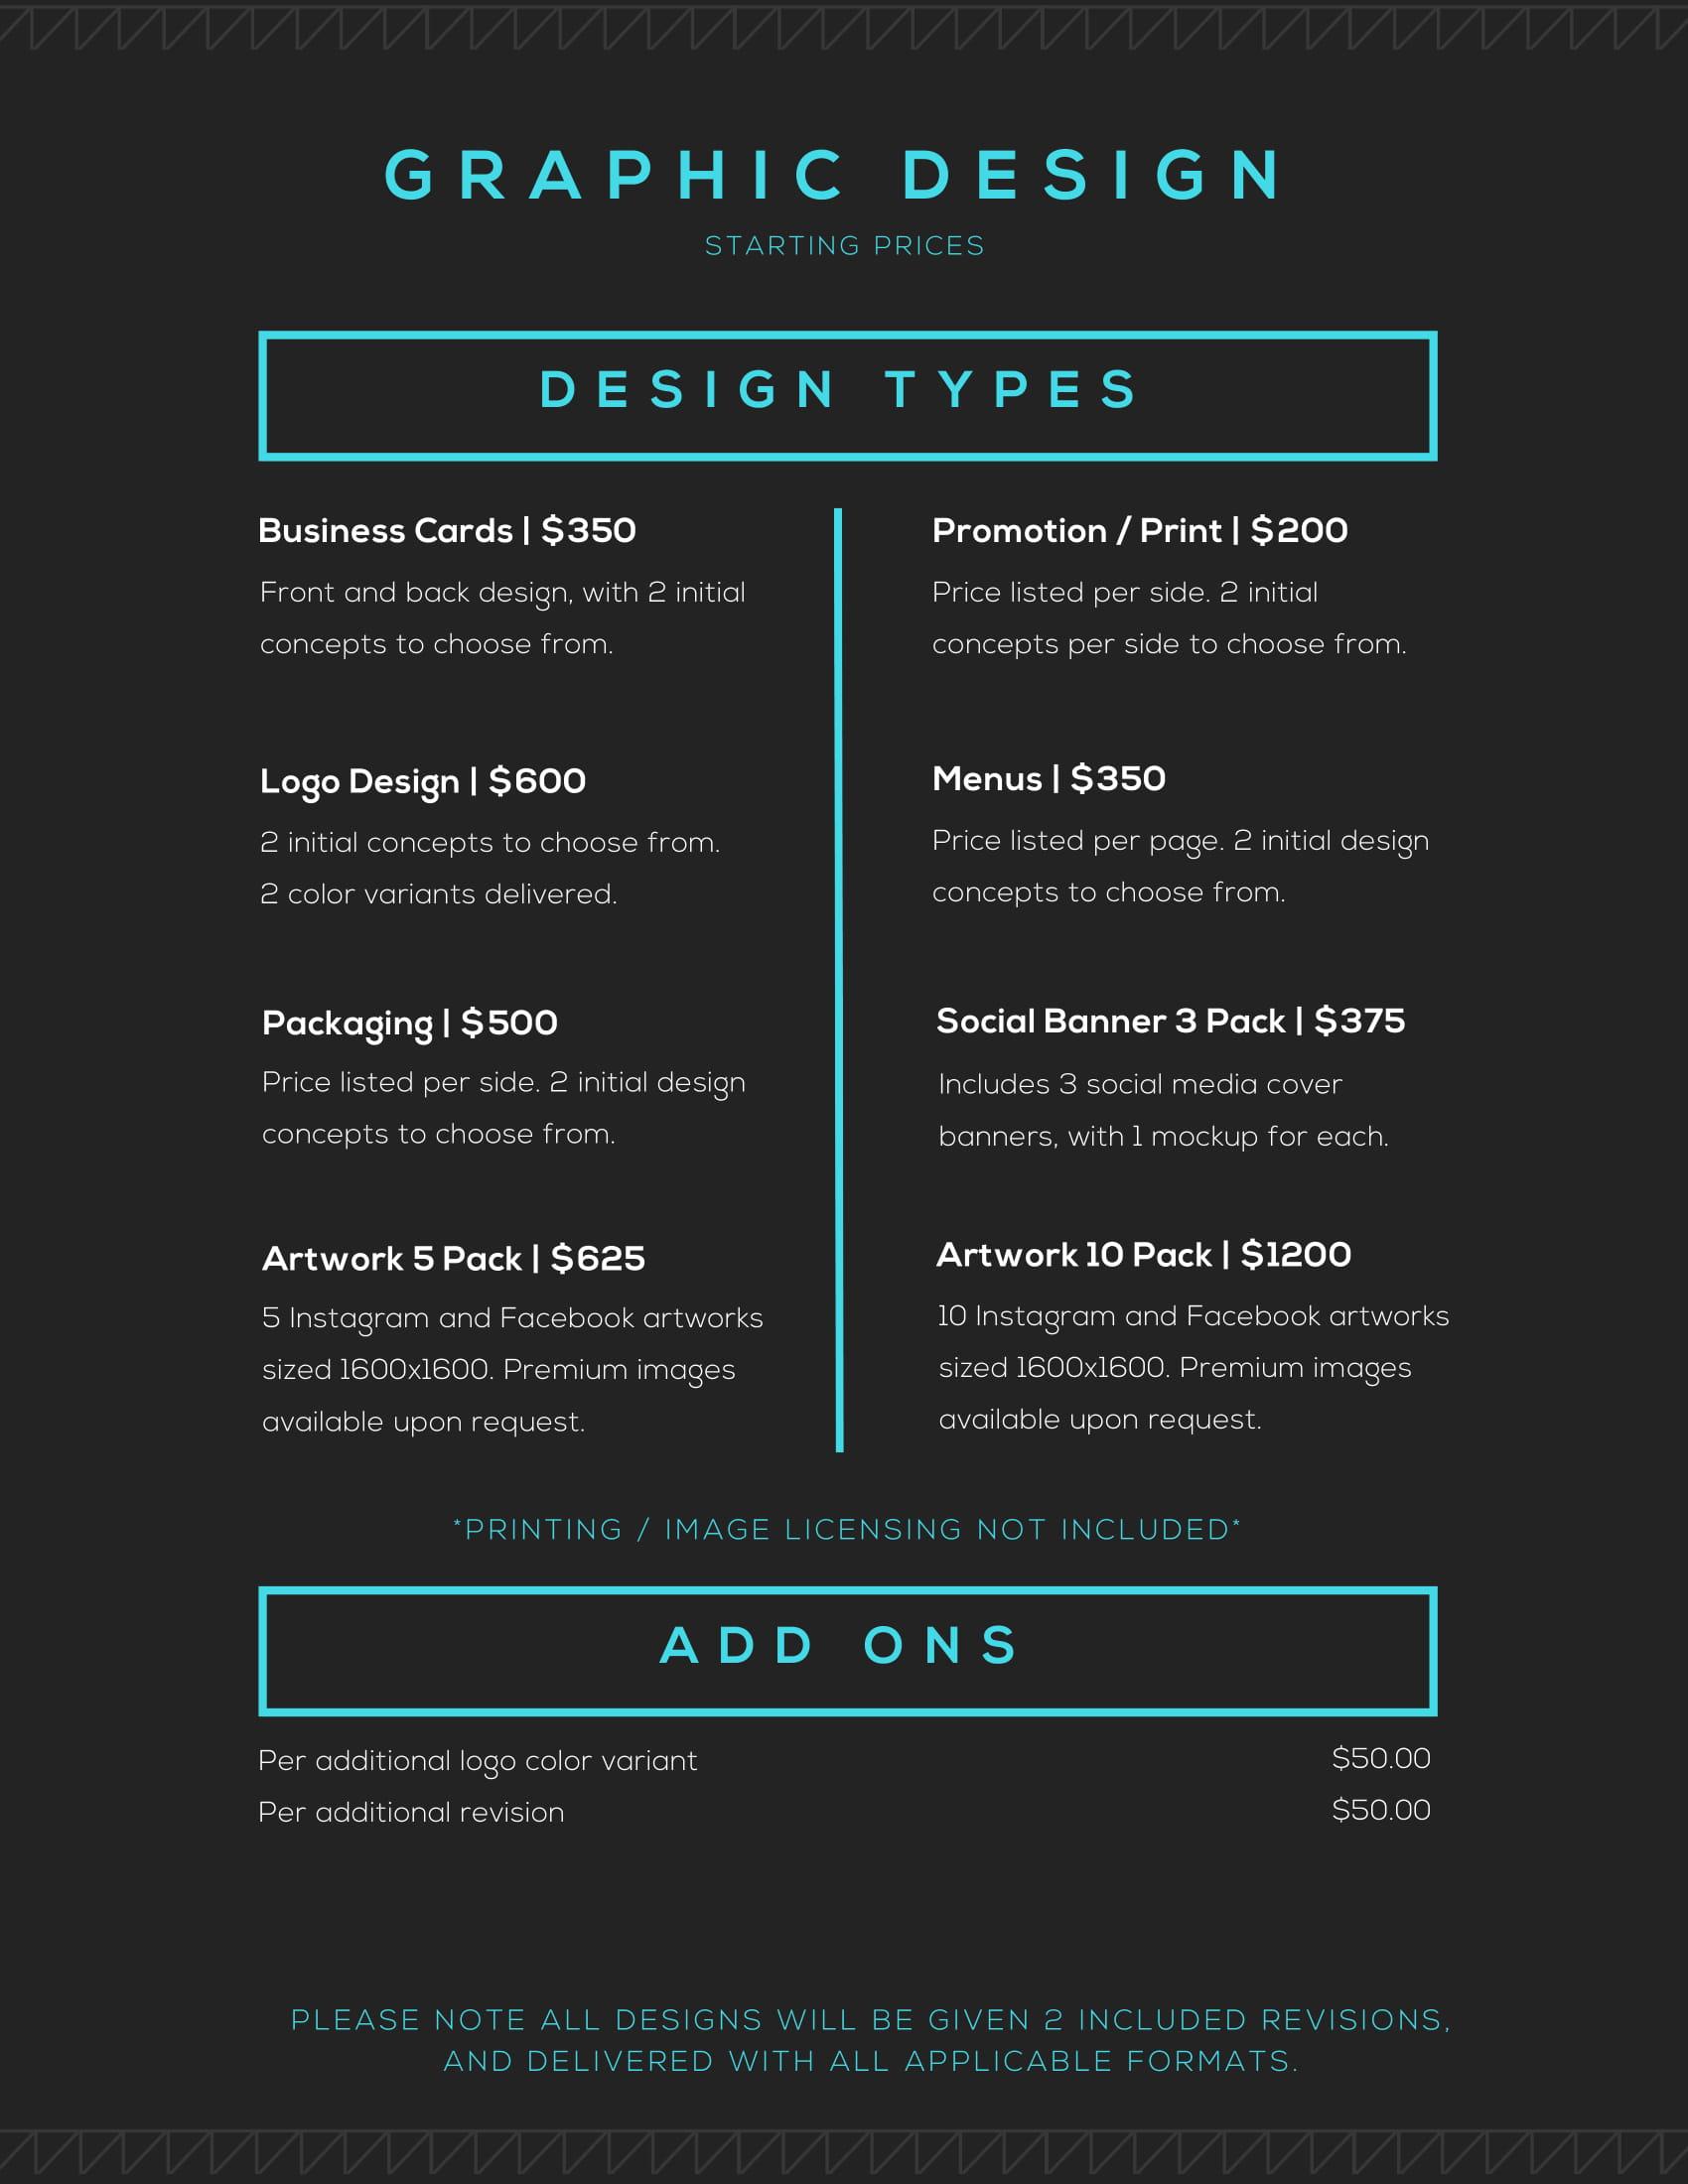 Graphic Design Price Chart (1)-1.jpg